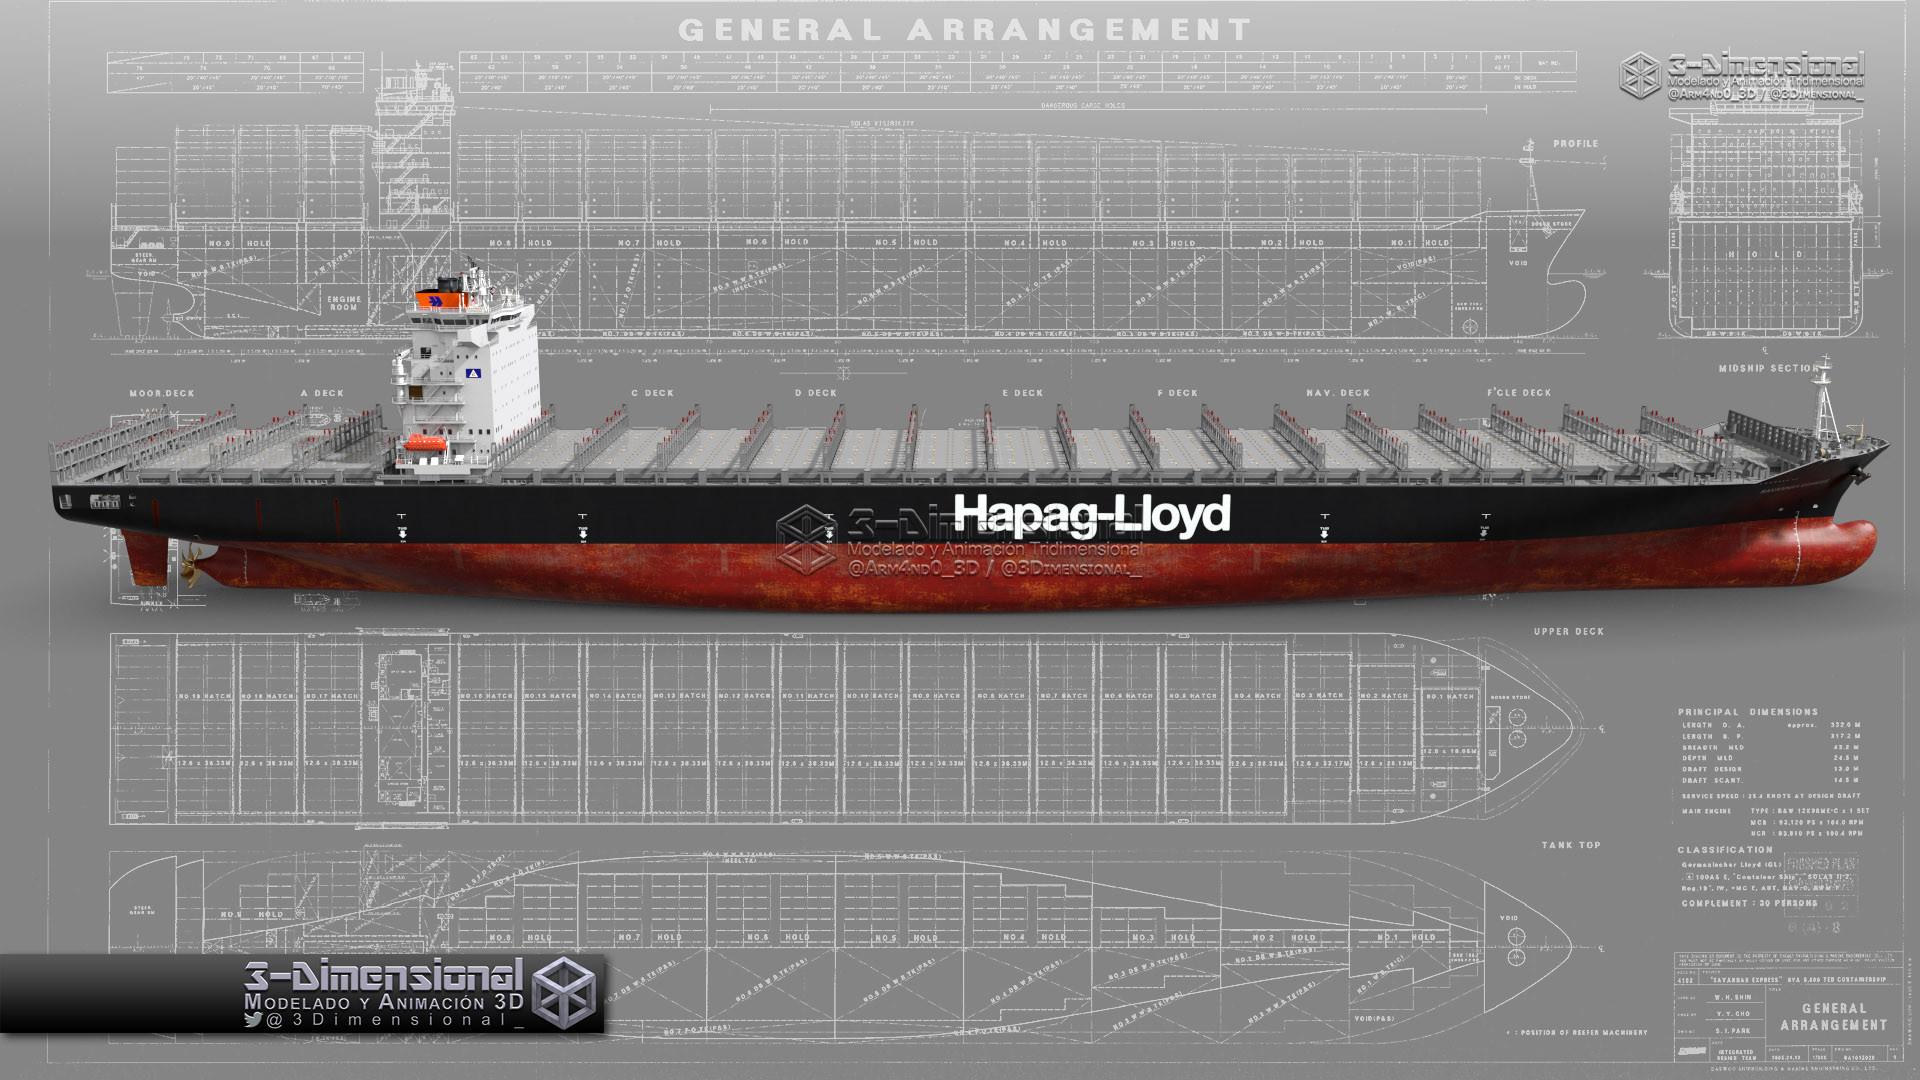 169 ️ 3 Dimensionarte Container Ship Savannah Express